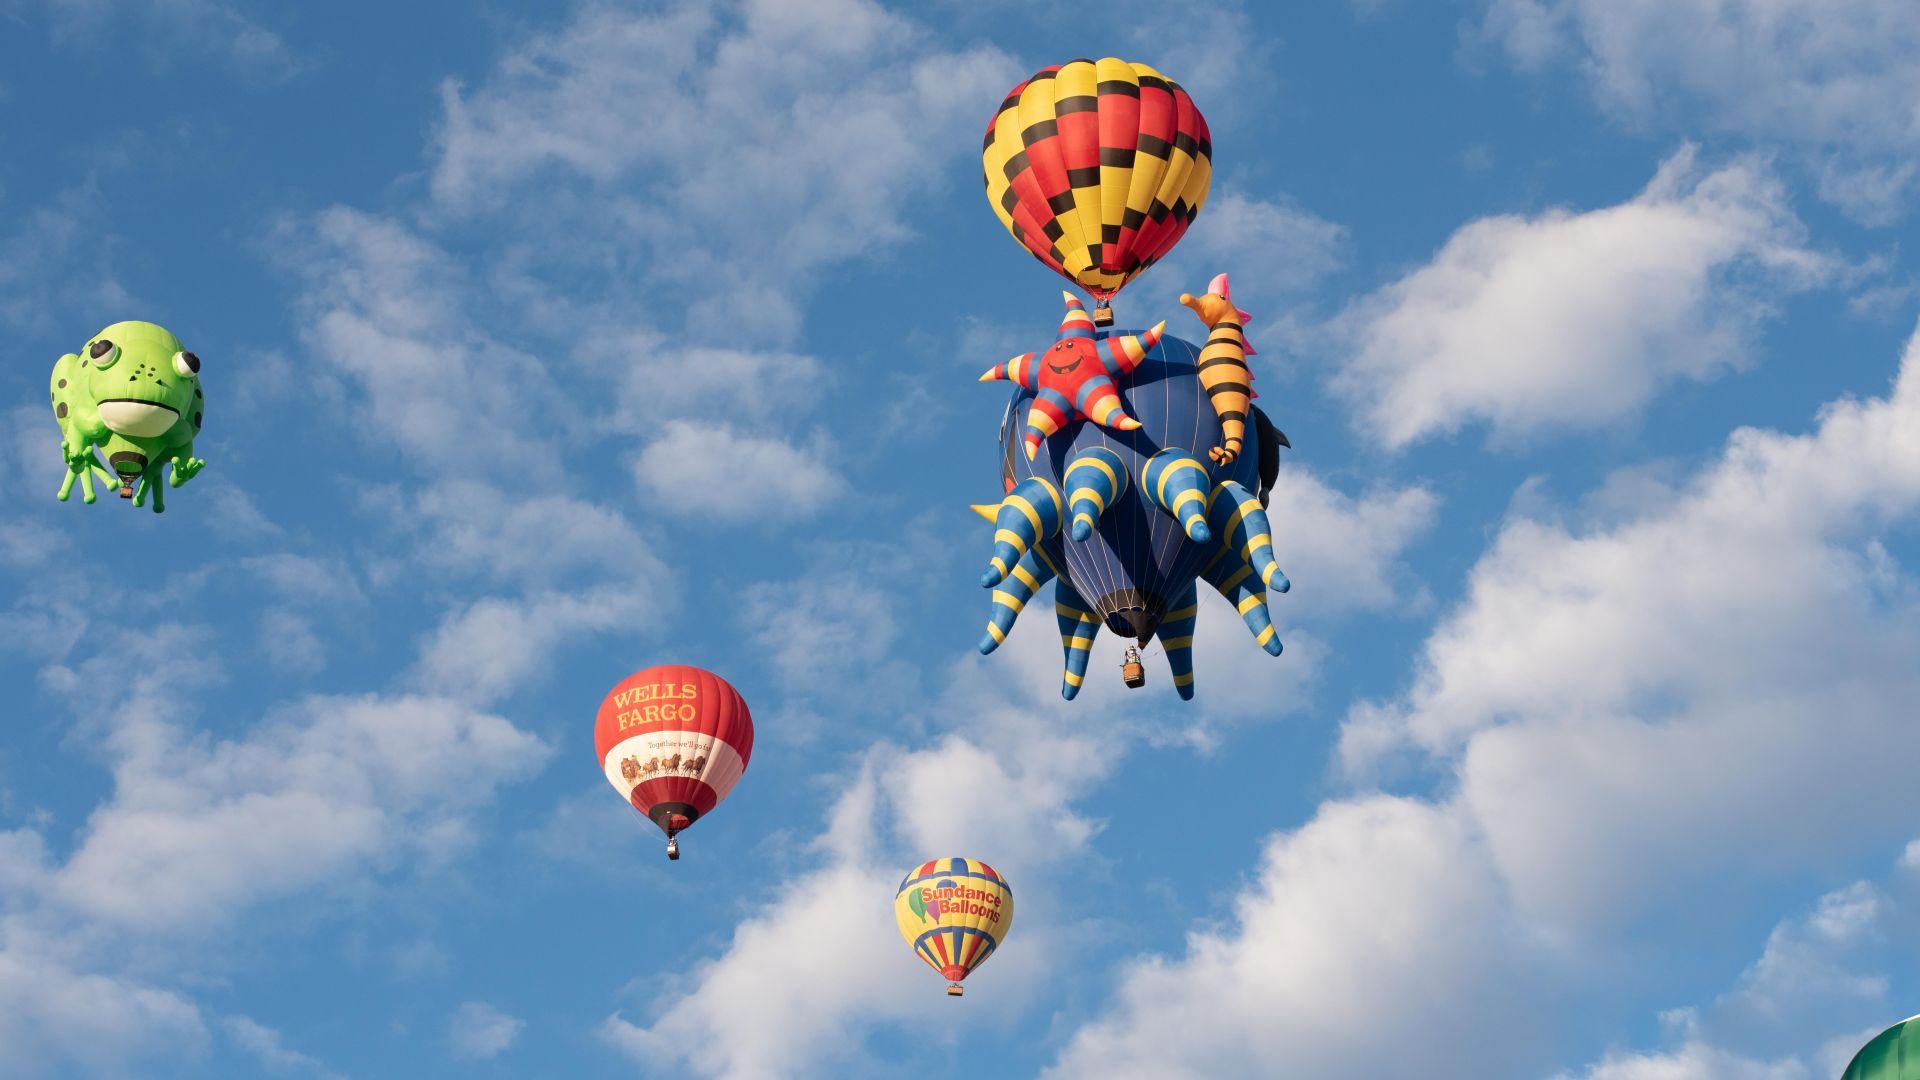 Hot air balloons from the 2017 Balloon Fiesta.